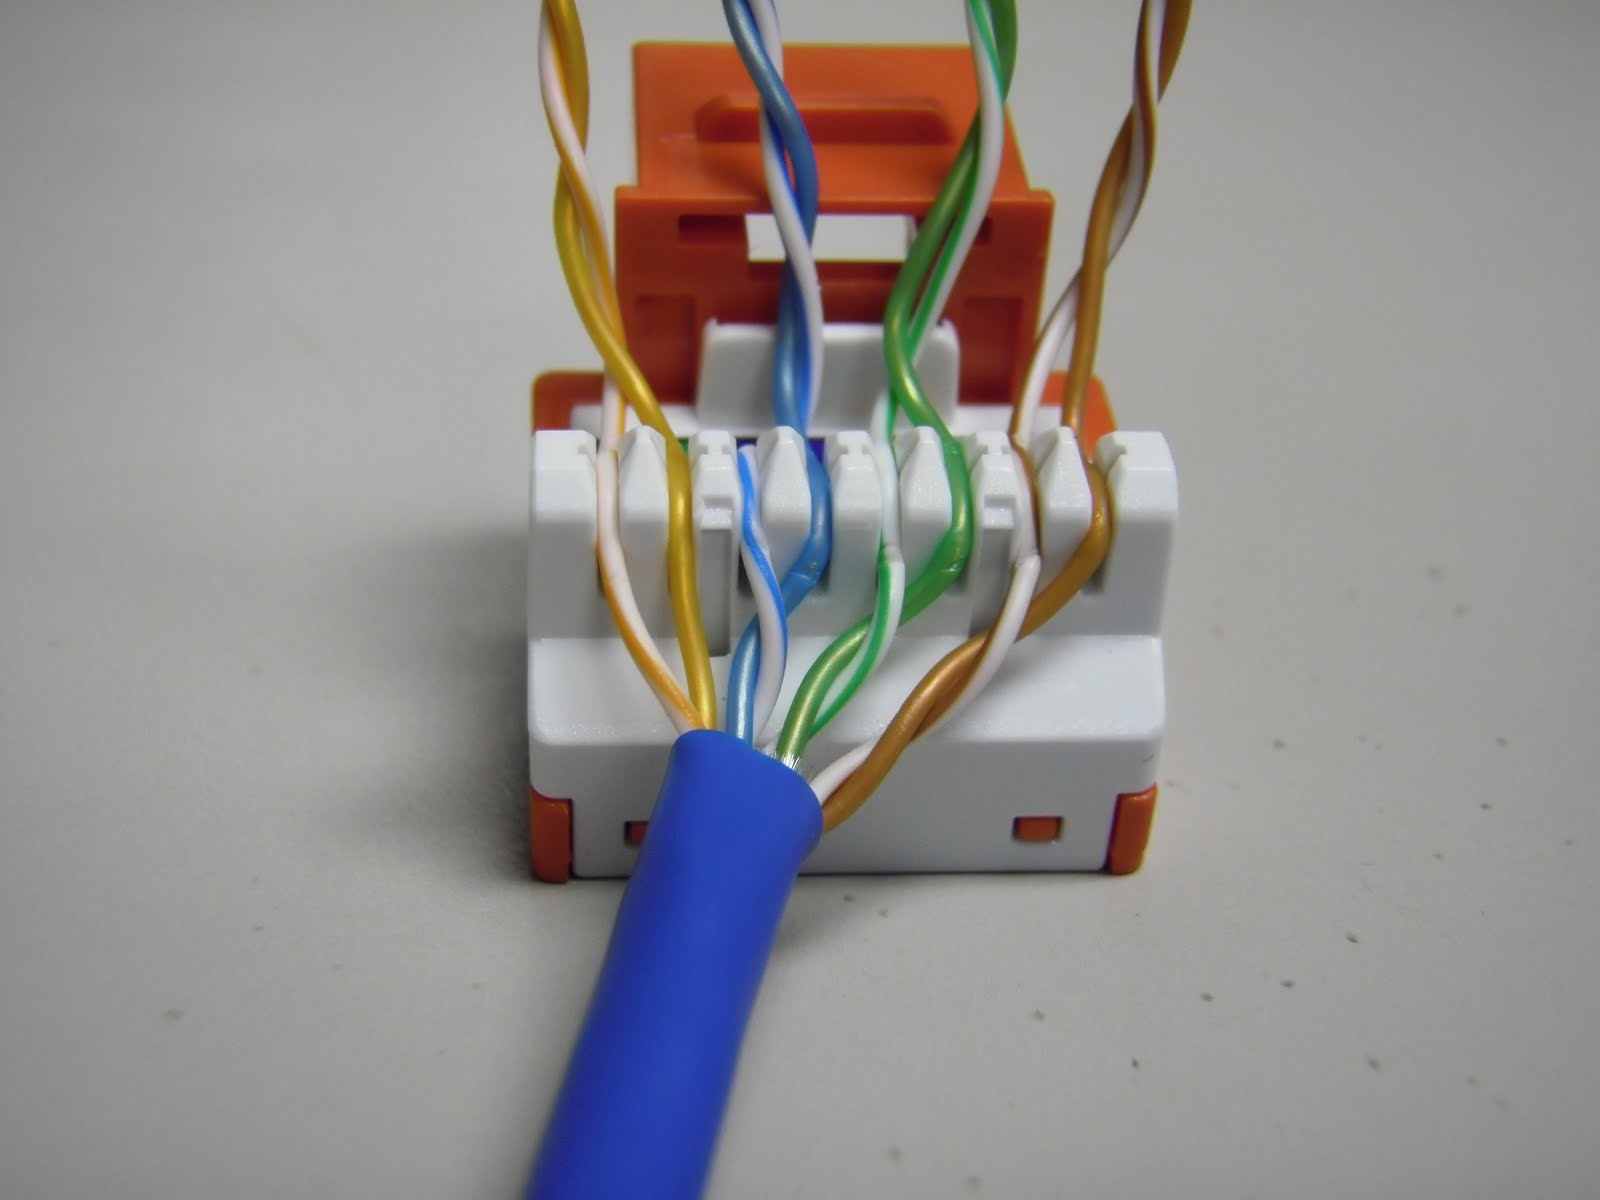 Cat 6 Jack Wiring - Wiring Diagram Data - Ethernet Wall Socket Wiring Diagram